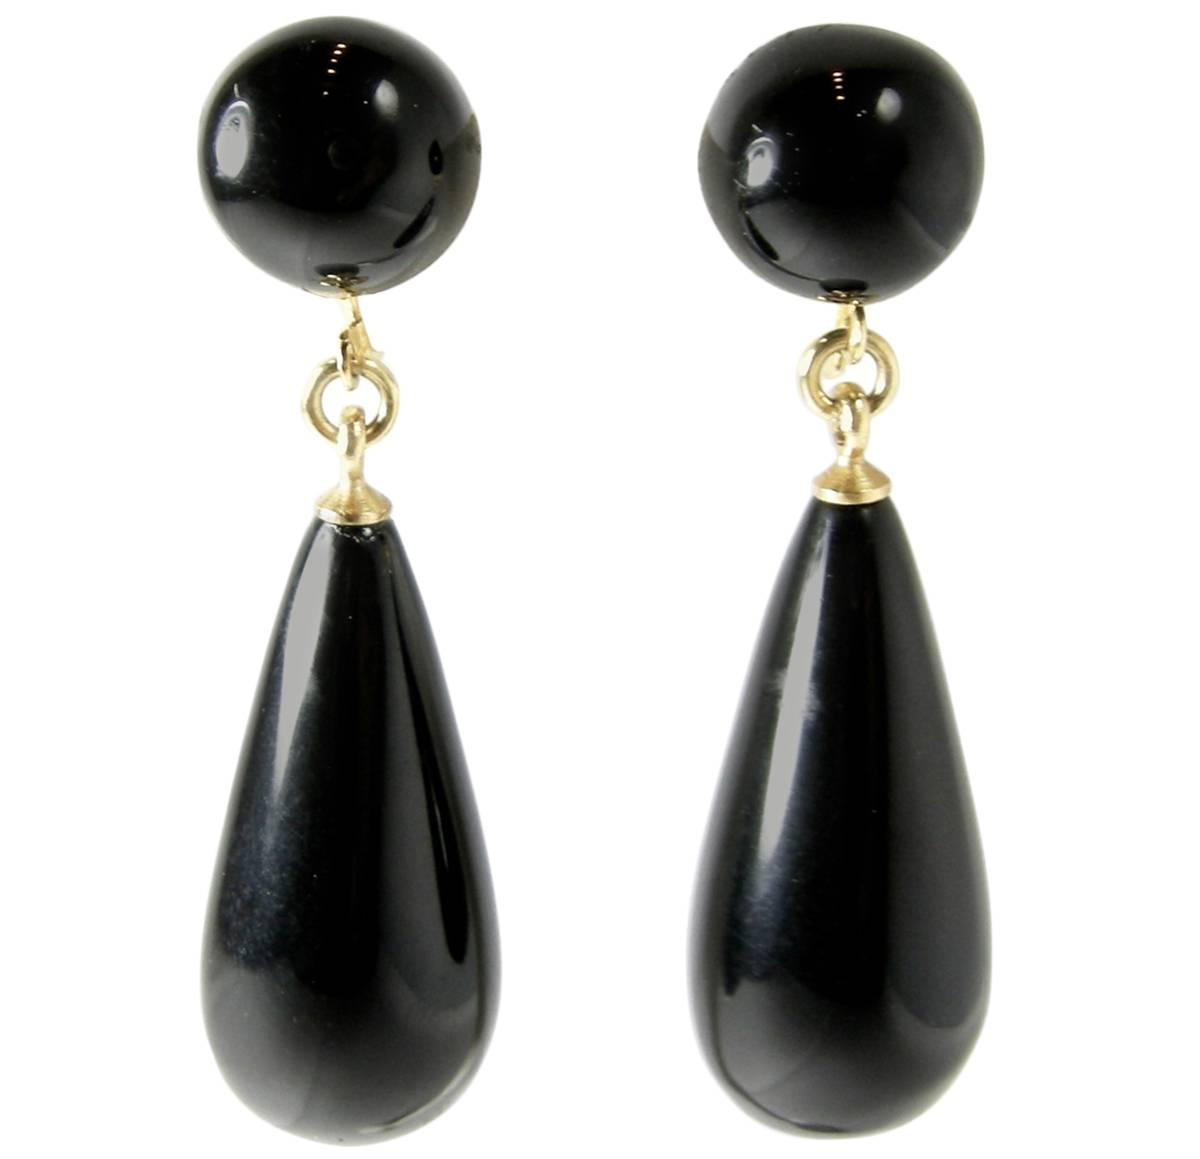 Vintage Kenneth Lane Black Teardrop Earrings For Sale at ...